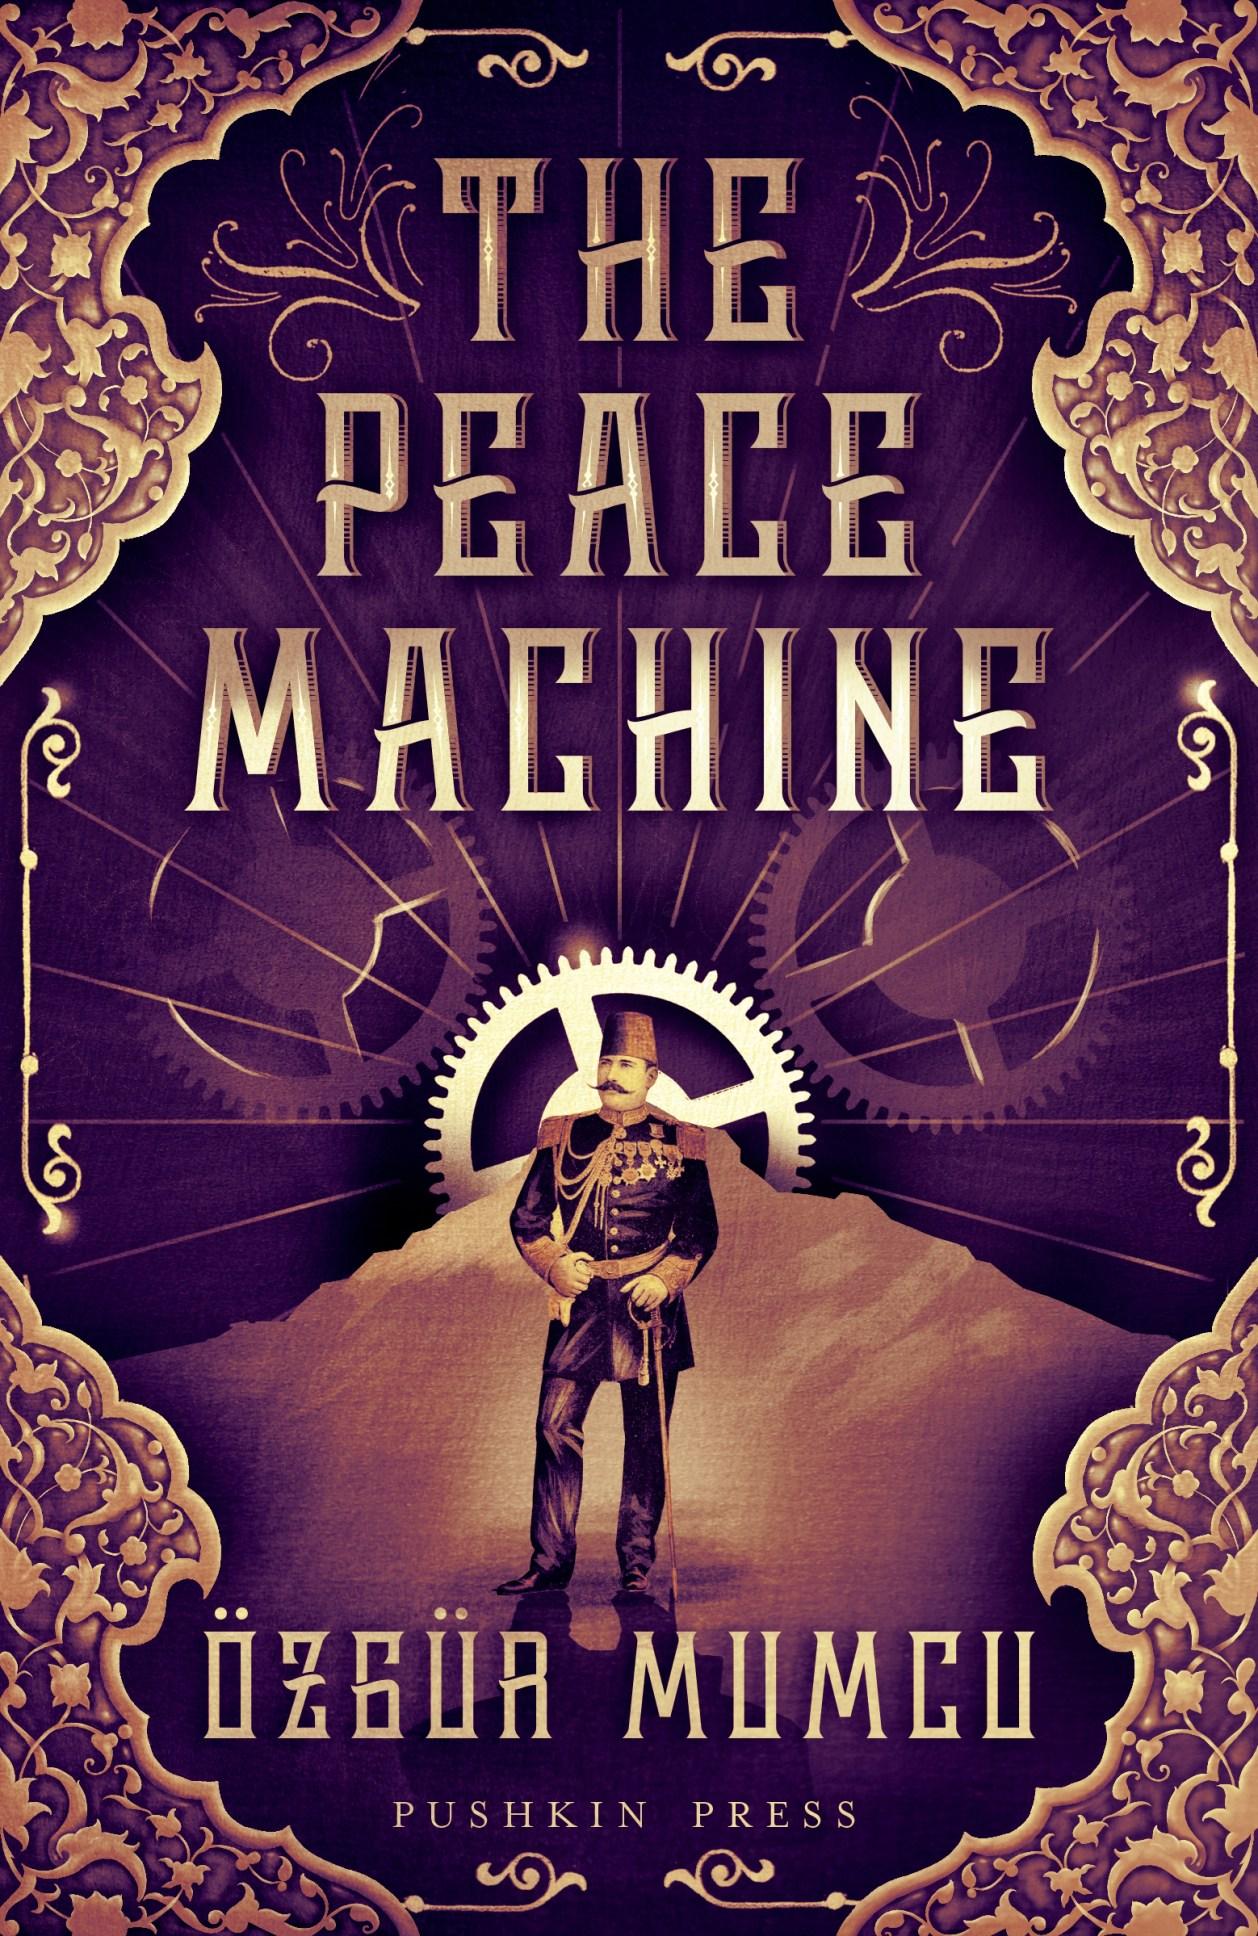 Barış Makinesi Özgür Mumcu2